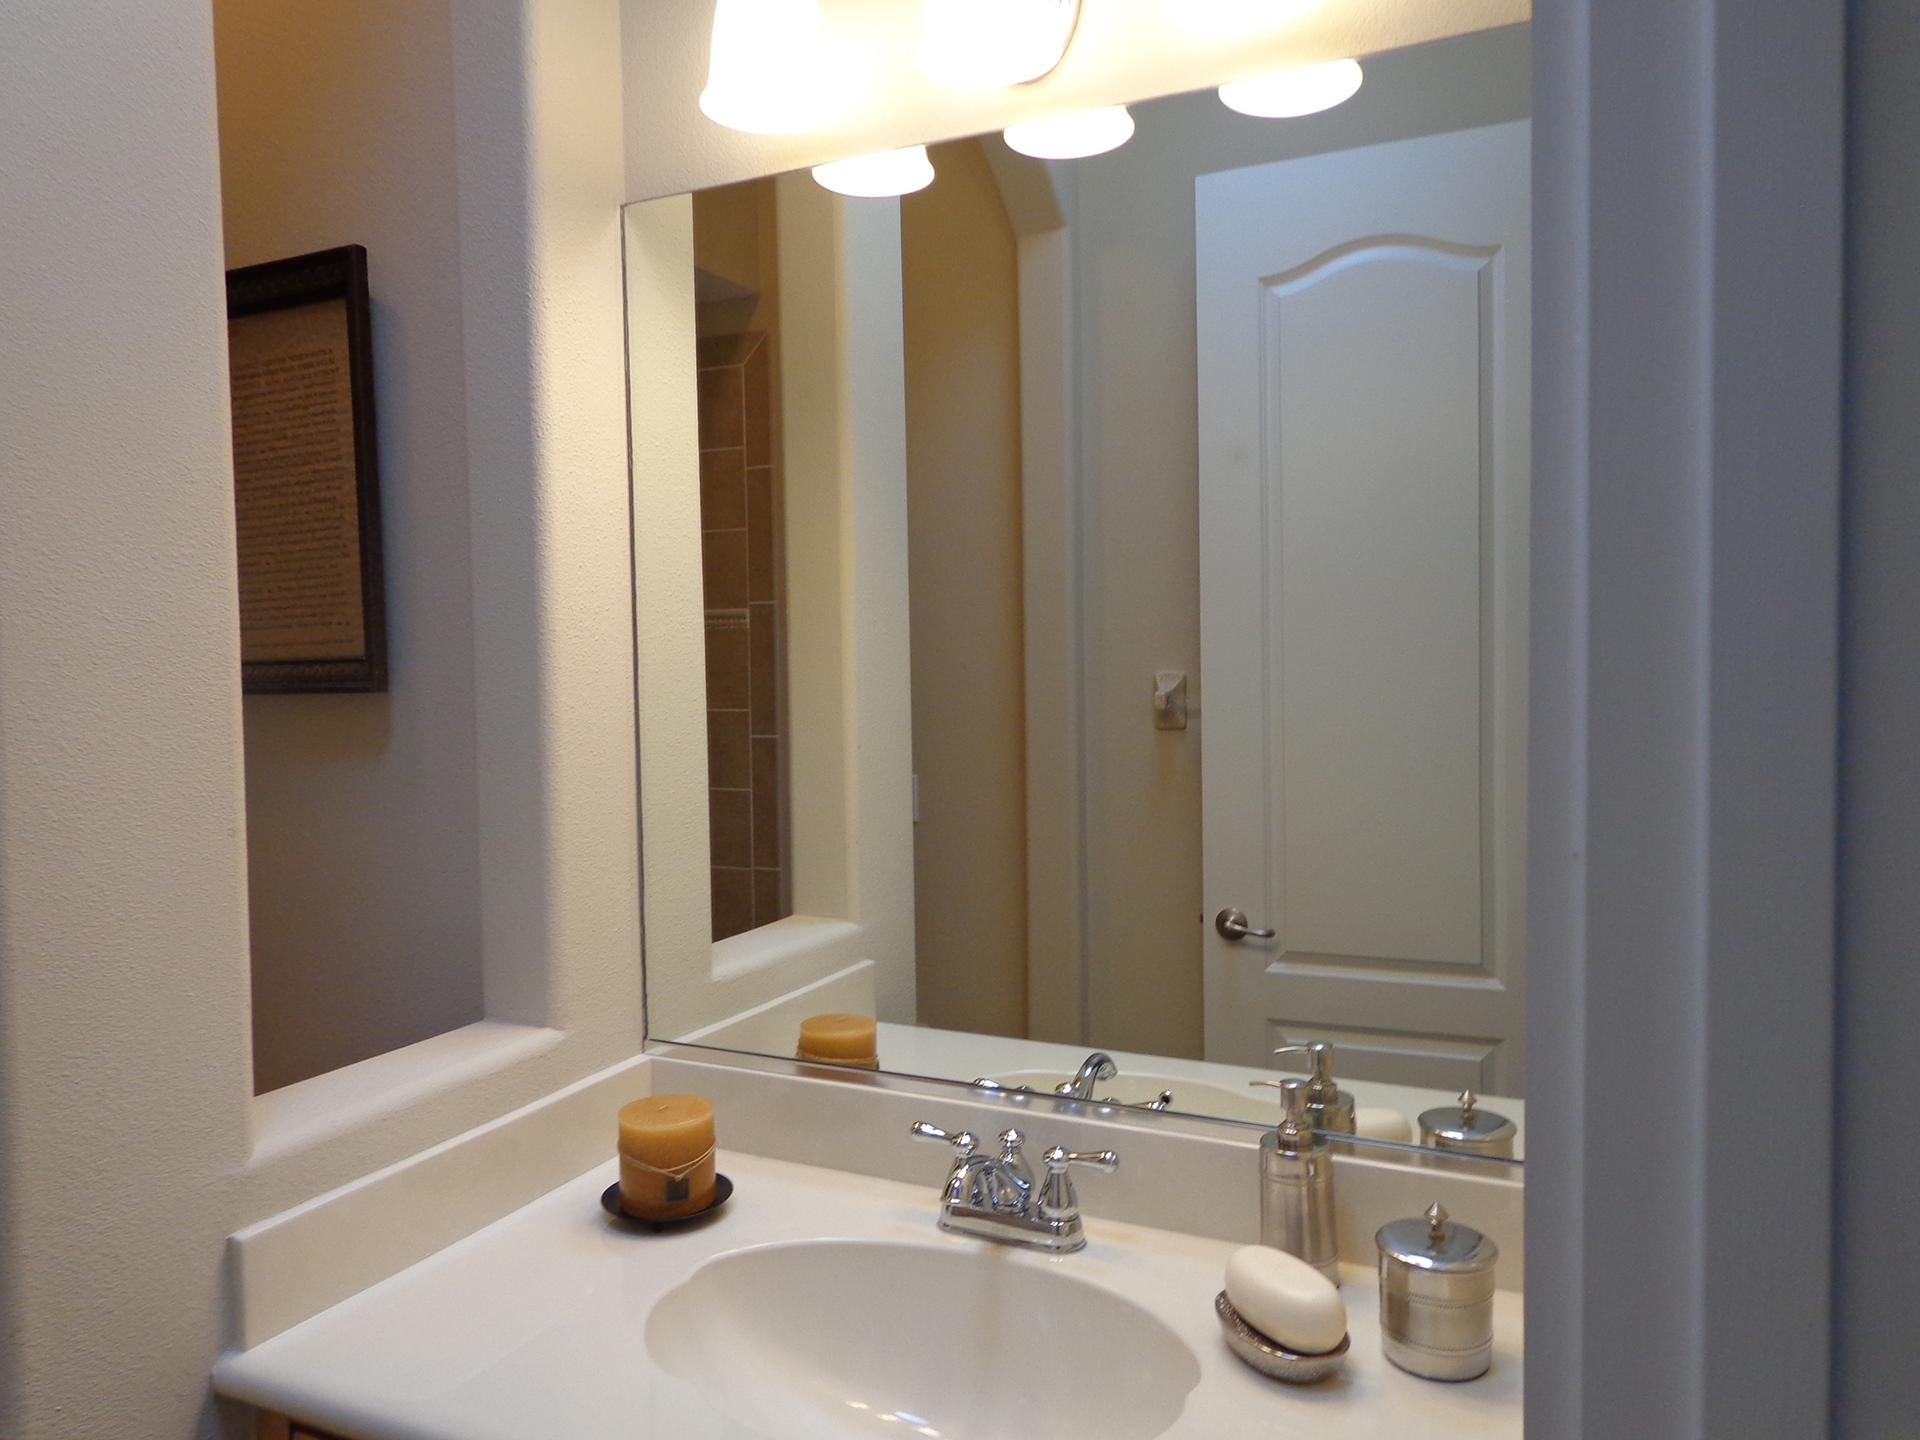 Staged-Assets-Home-Staging-Interior-Design-Palm-Coast-Florida-11